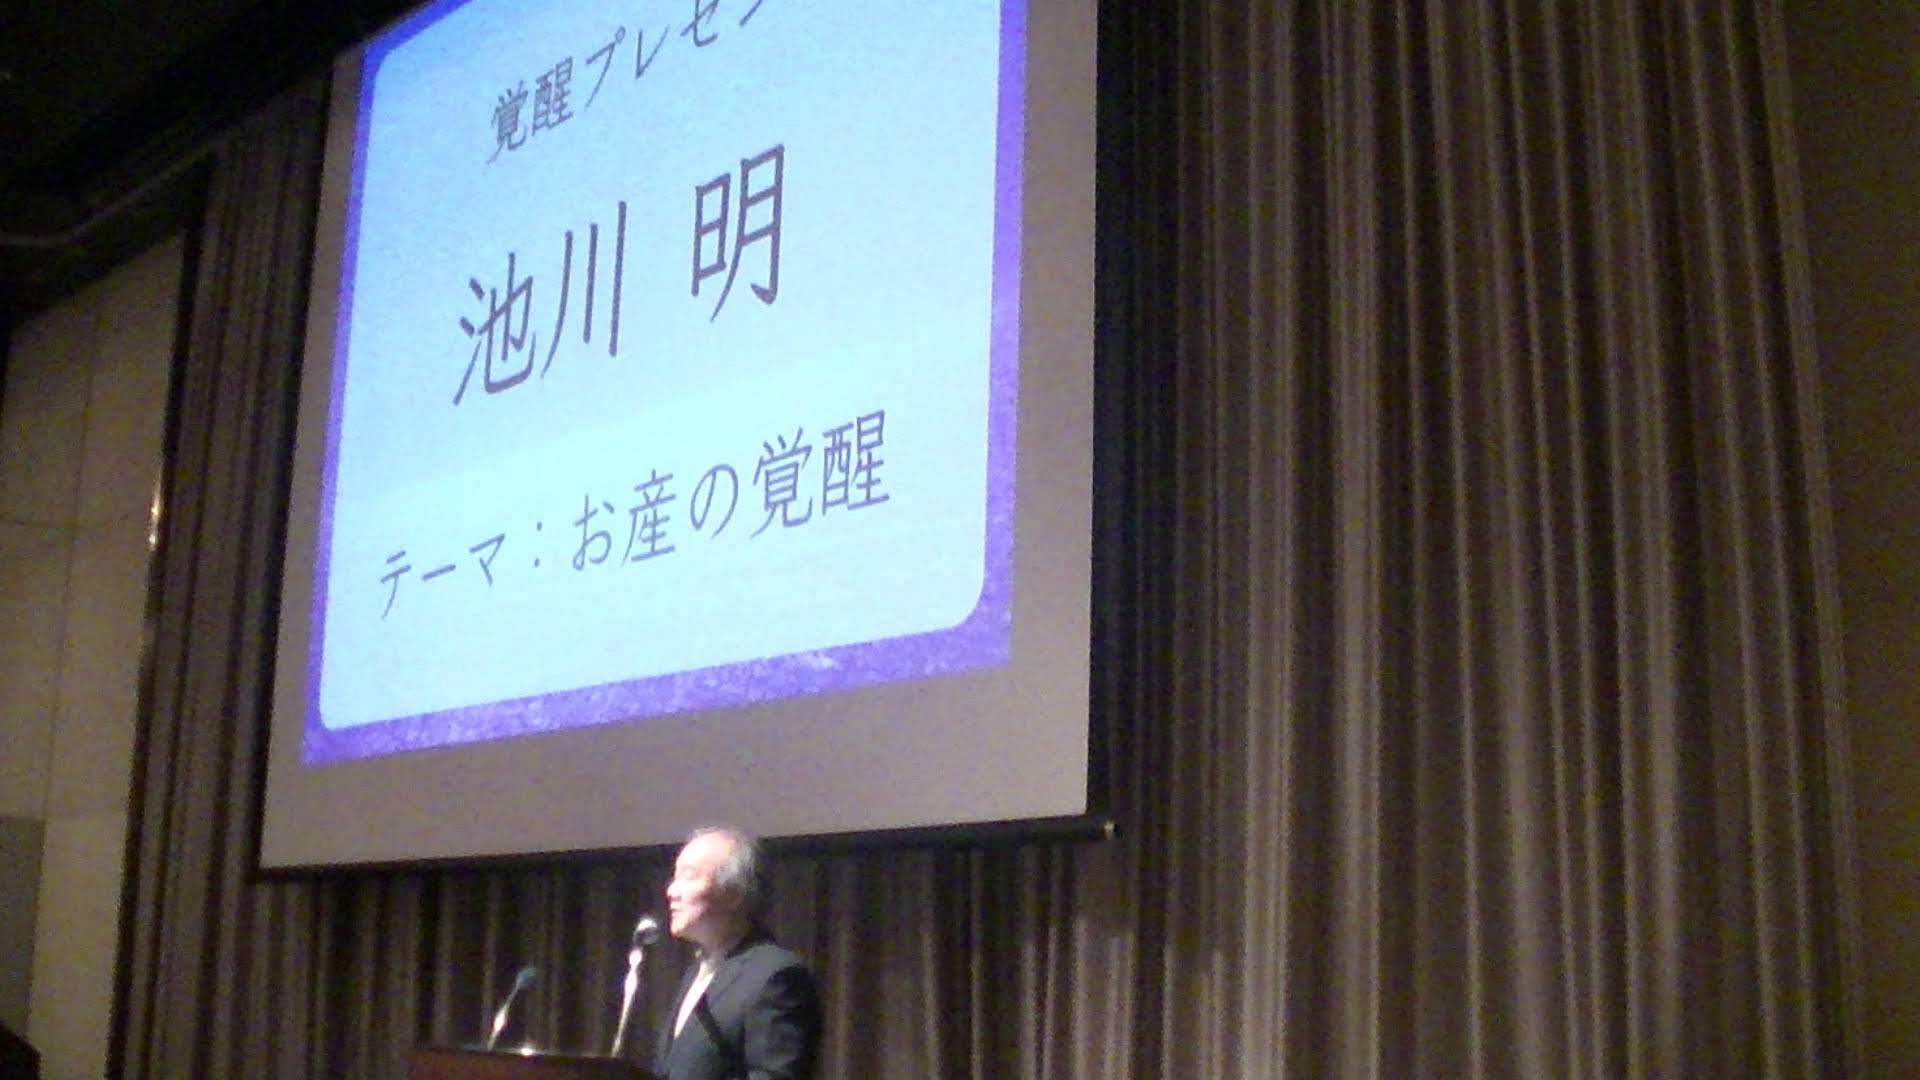 PIC 1755 1 - 思風会全国大会in広島